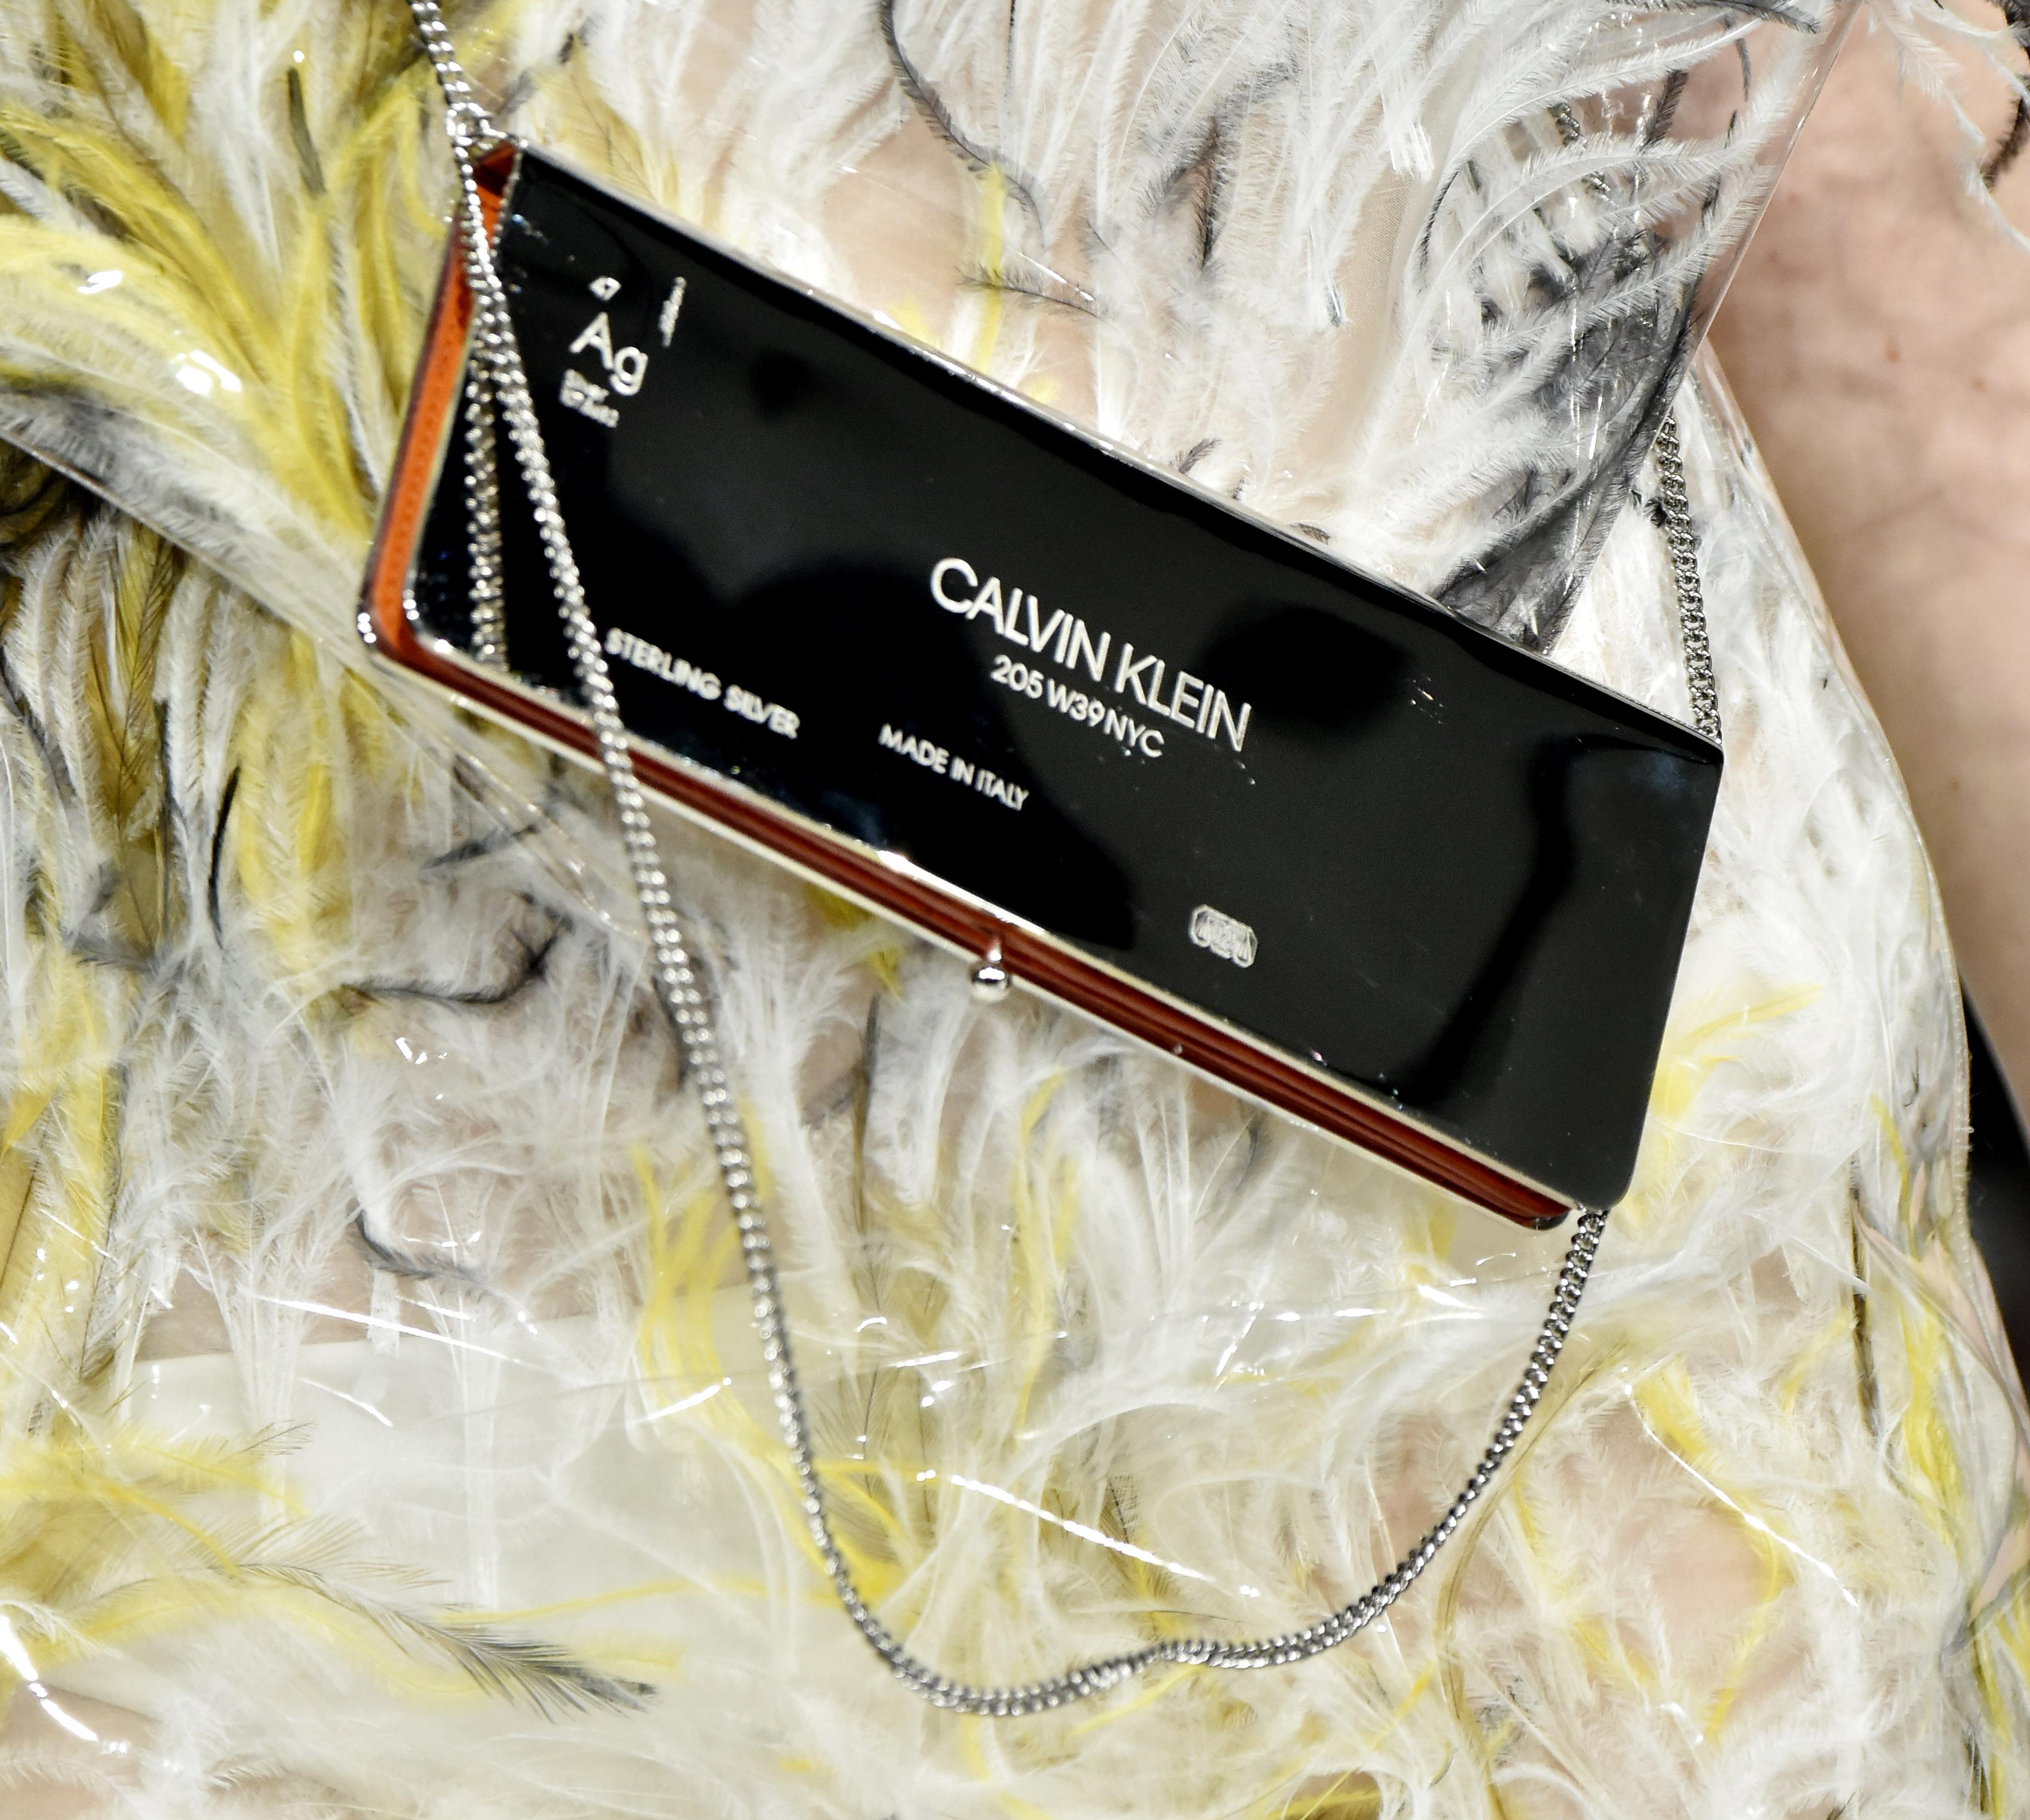 Model on the catwalk, detailCalvin Klein show, Runway, Fall Winter 2017, New York Fashion Week, USA - 10 Feb 2017